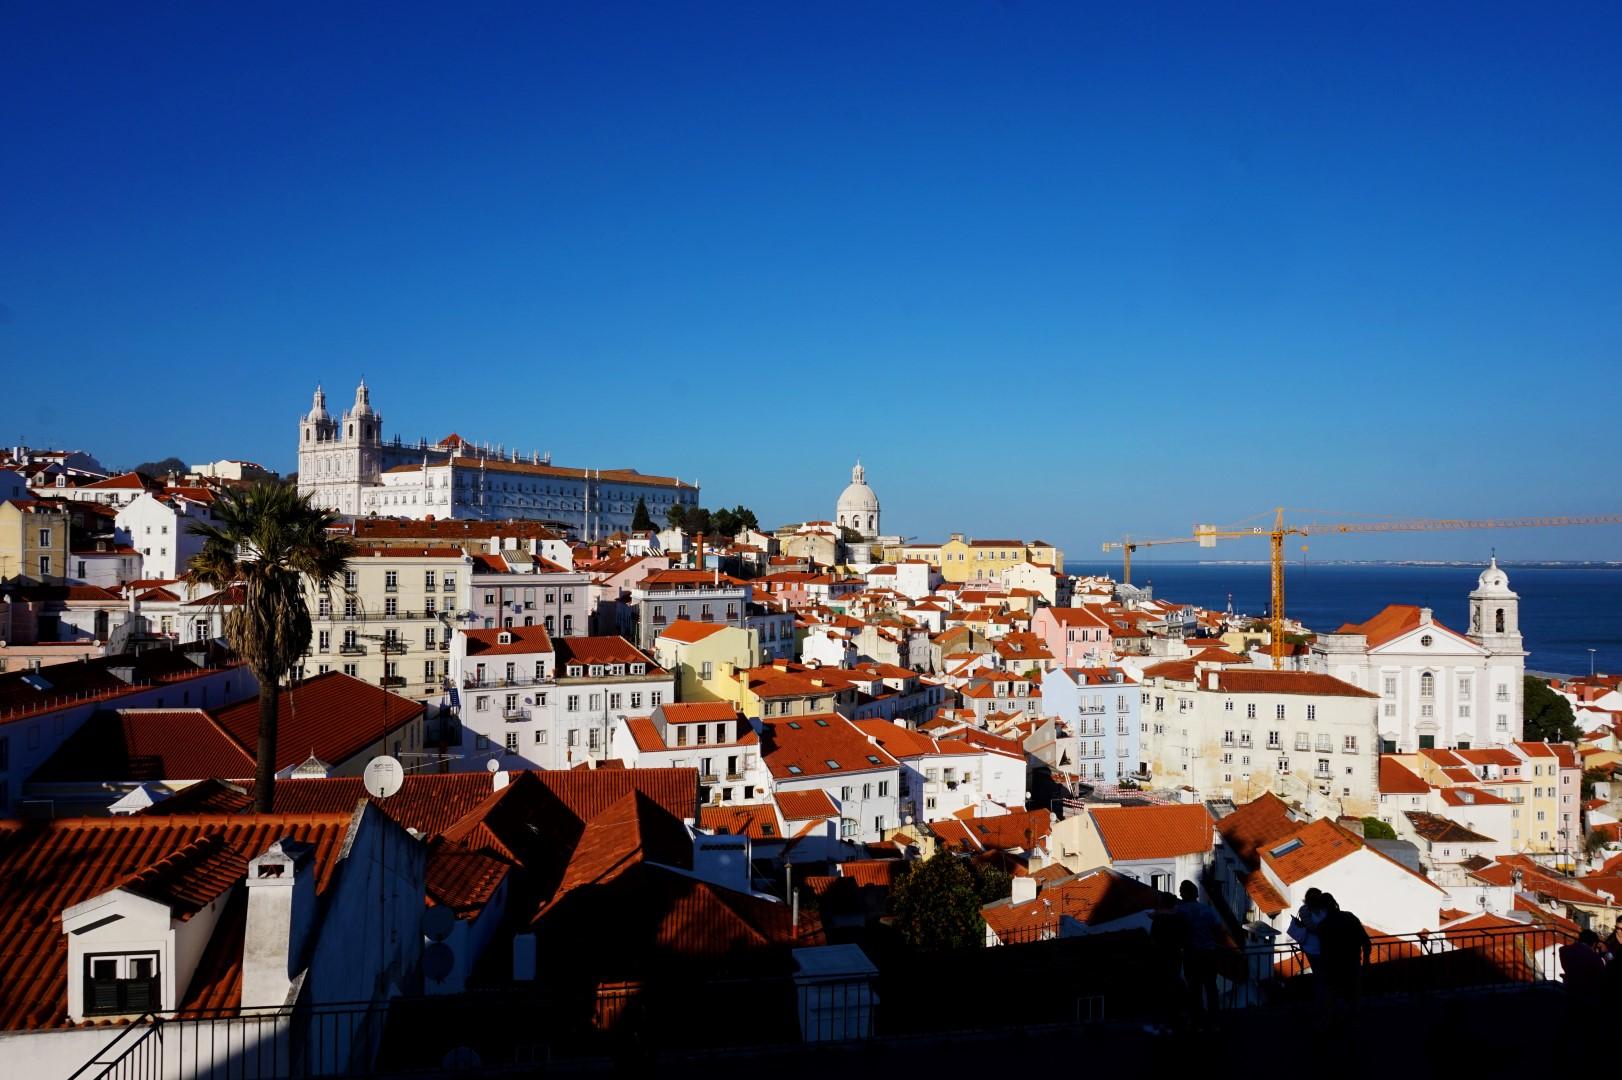 Lisbonne - Balade dans l'Afalma